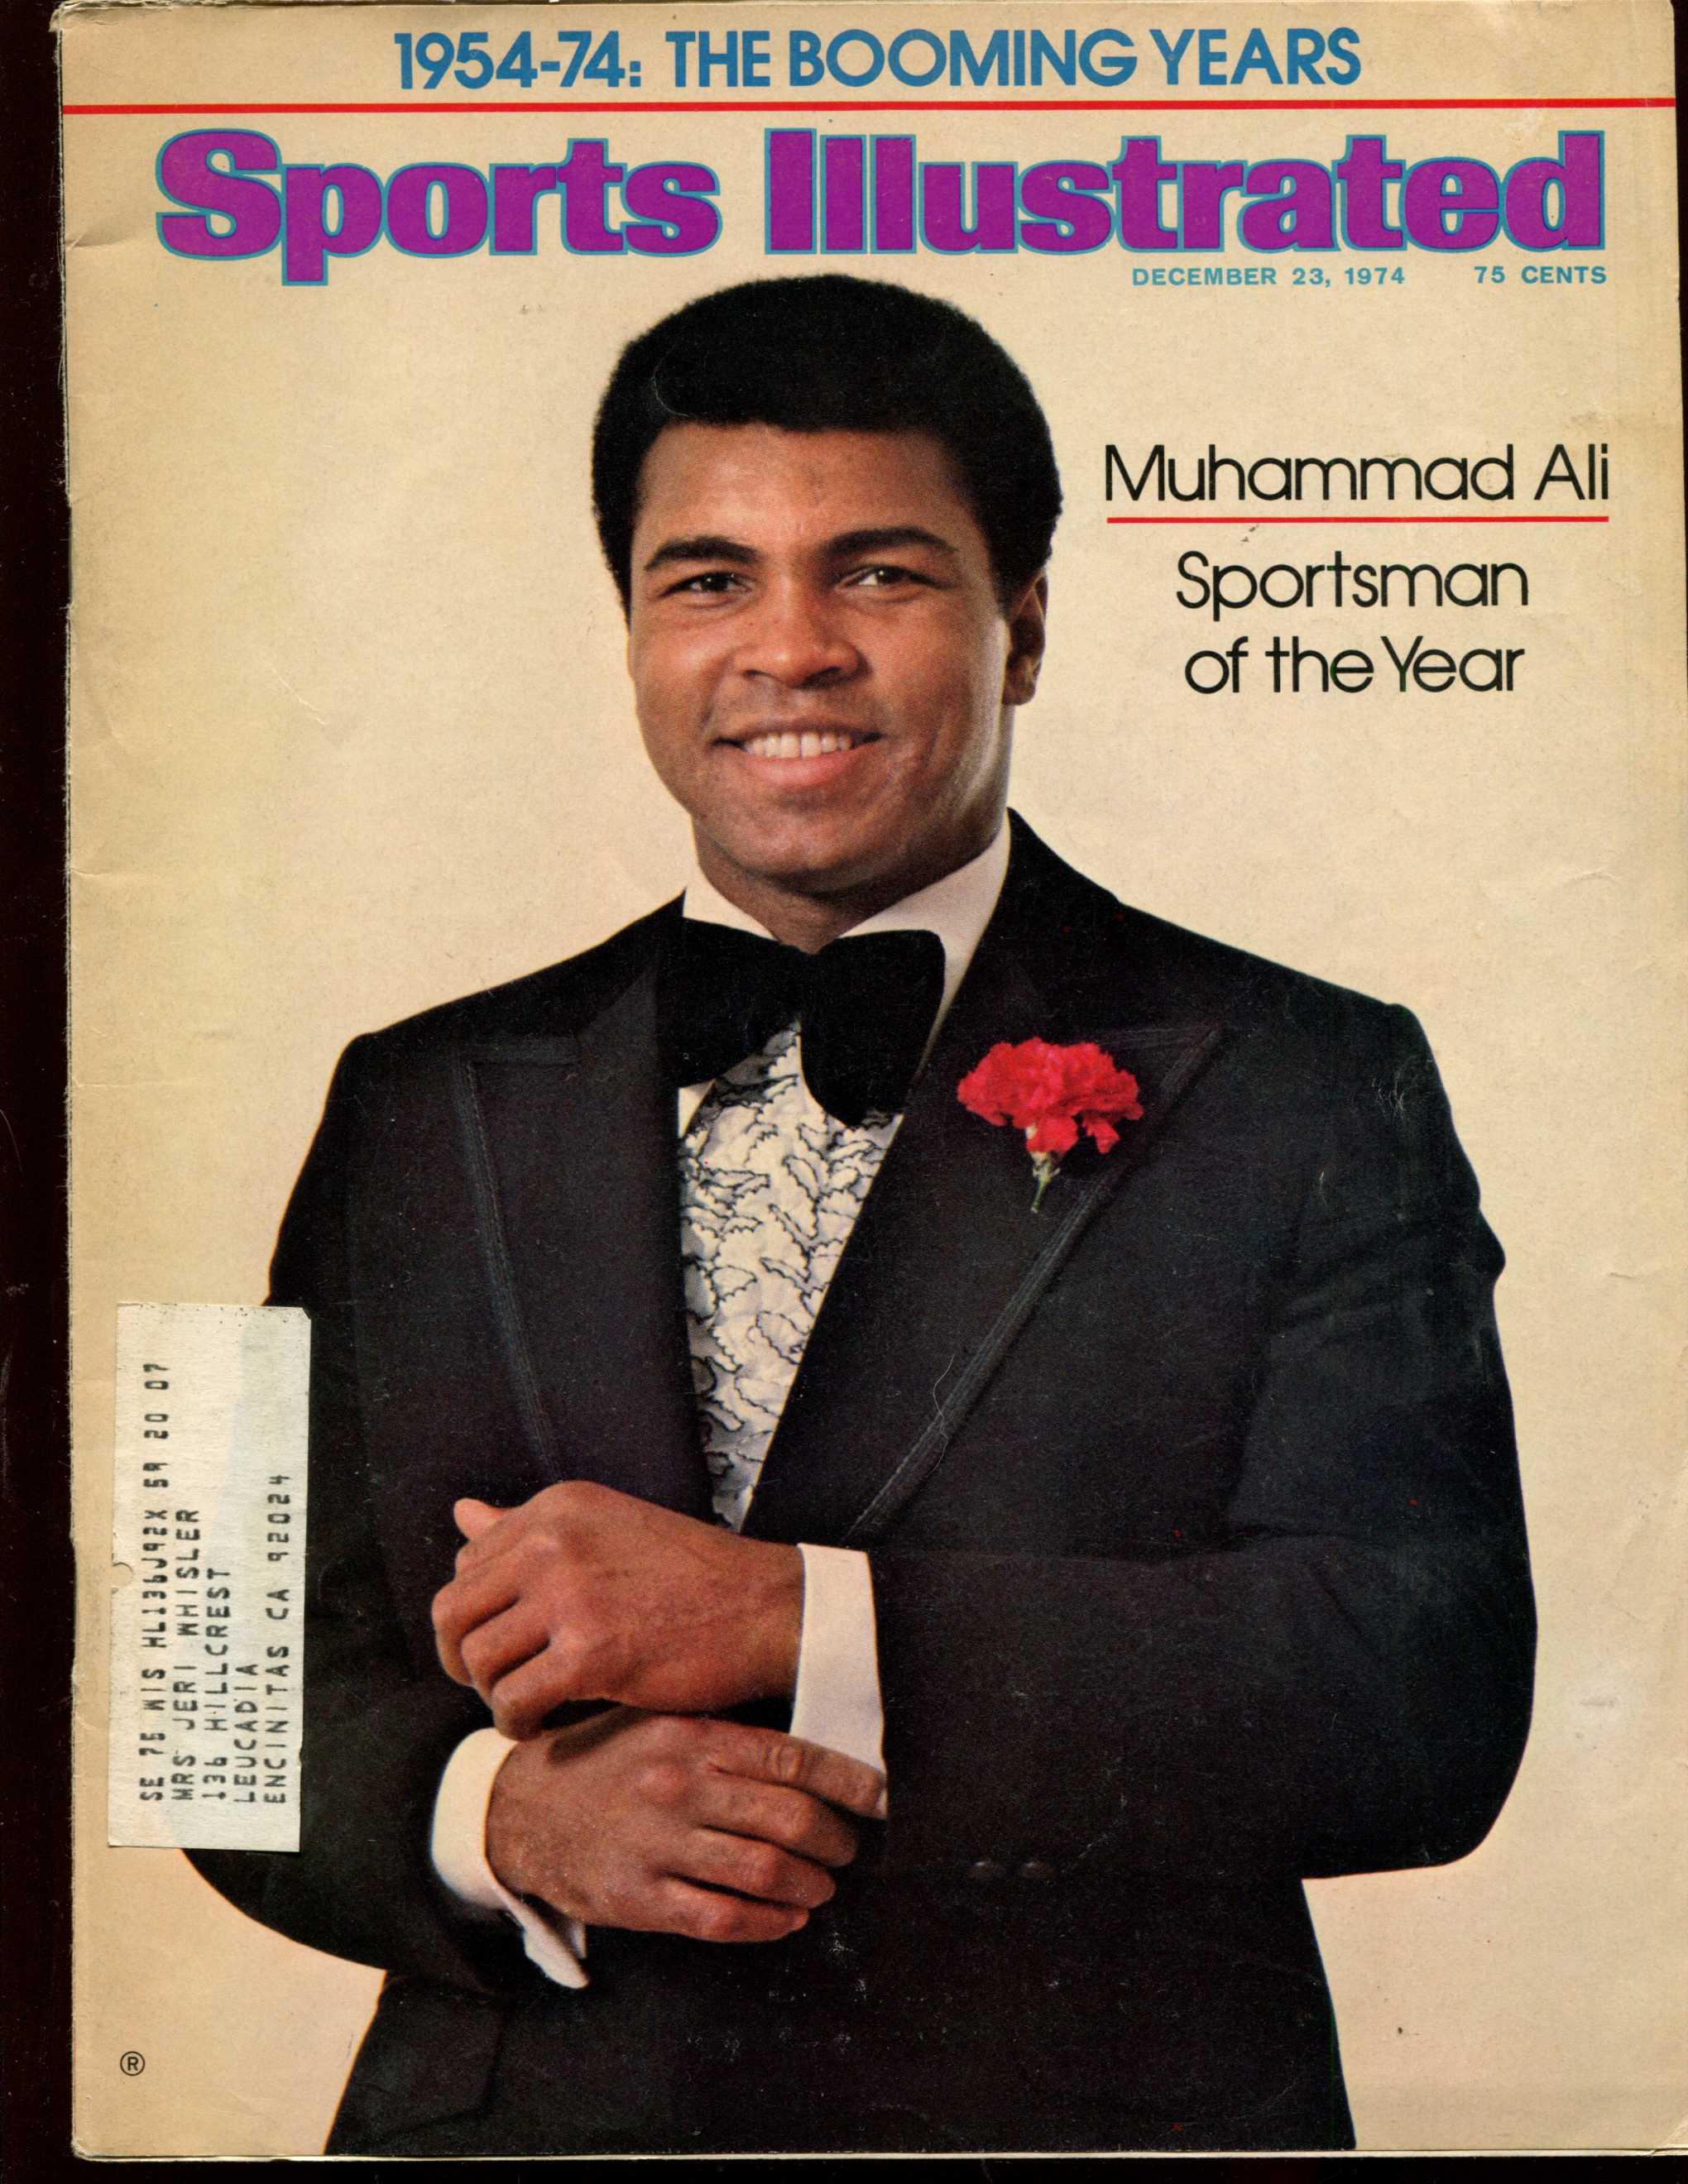 Sports Illustrated (1974/12/23) - Muhammad Ali SPORTSMAN of